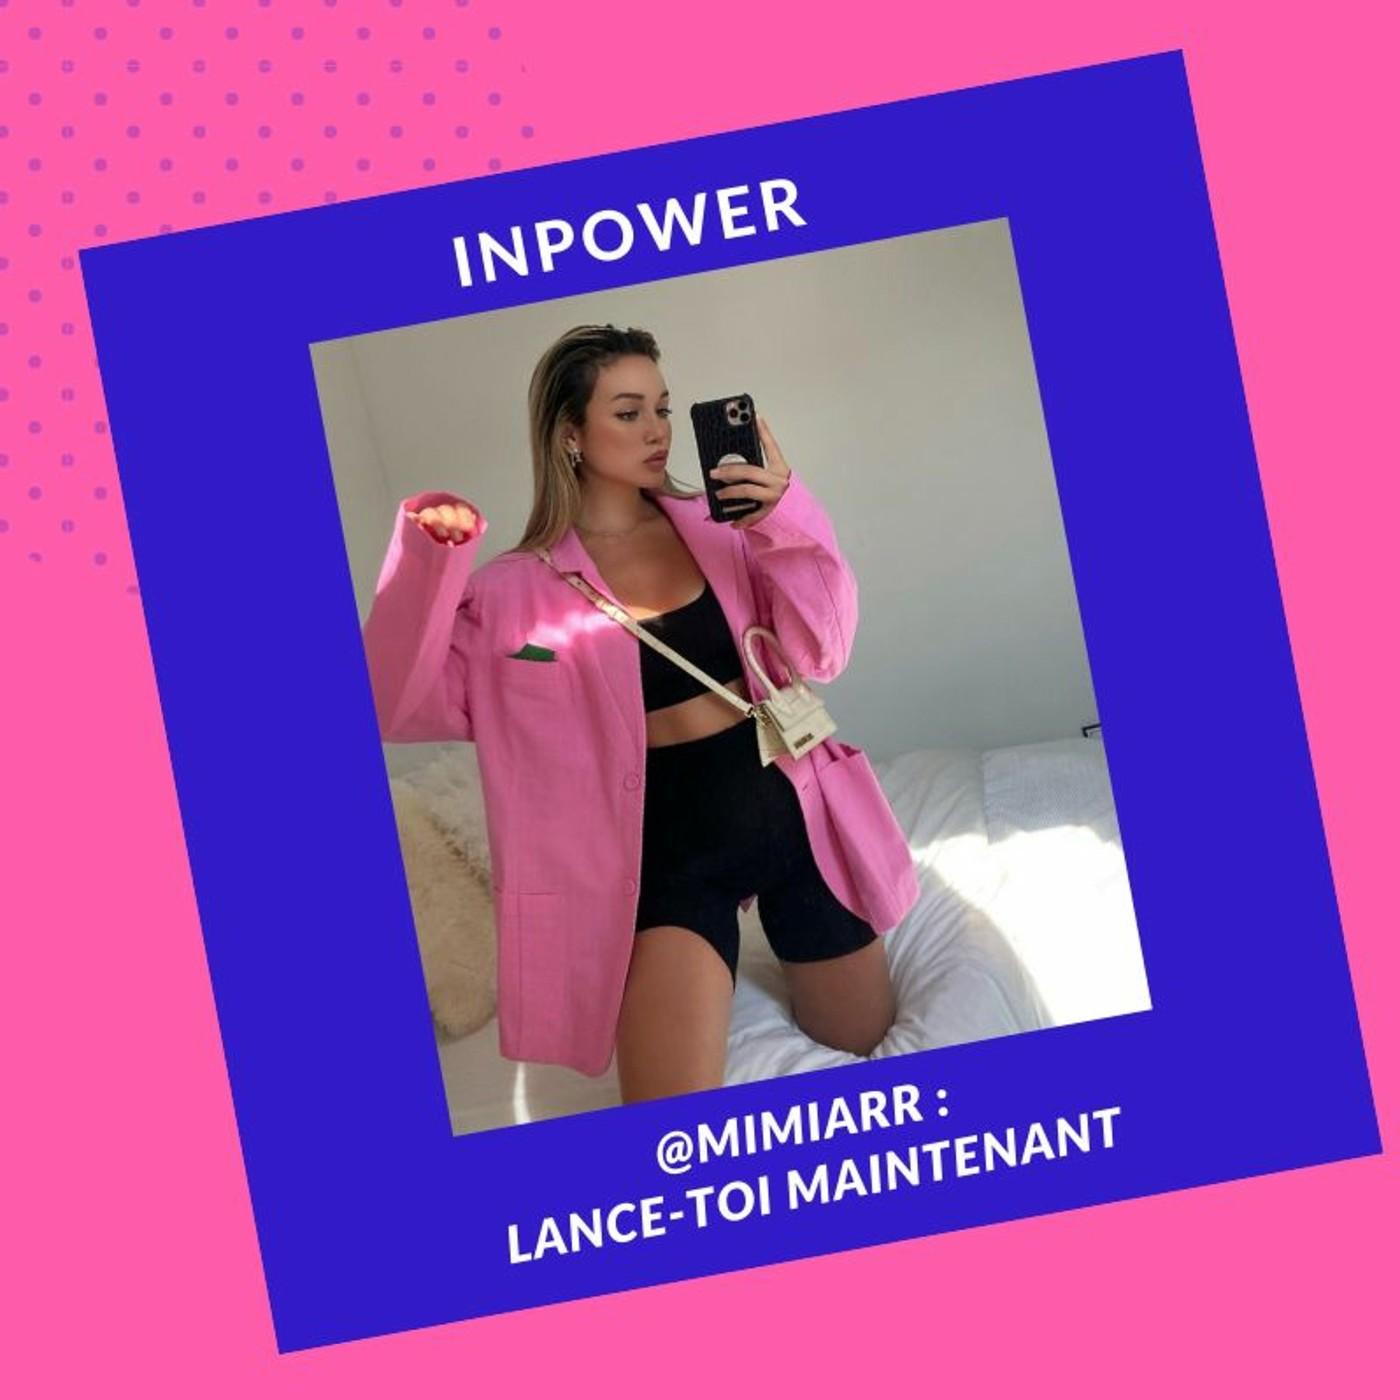 @MimiArr - Lance-toi maintenant